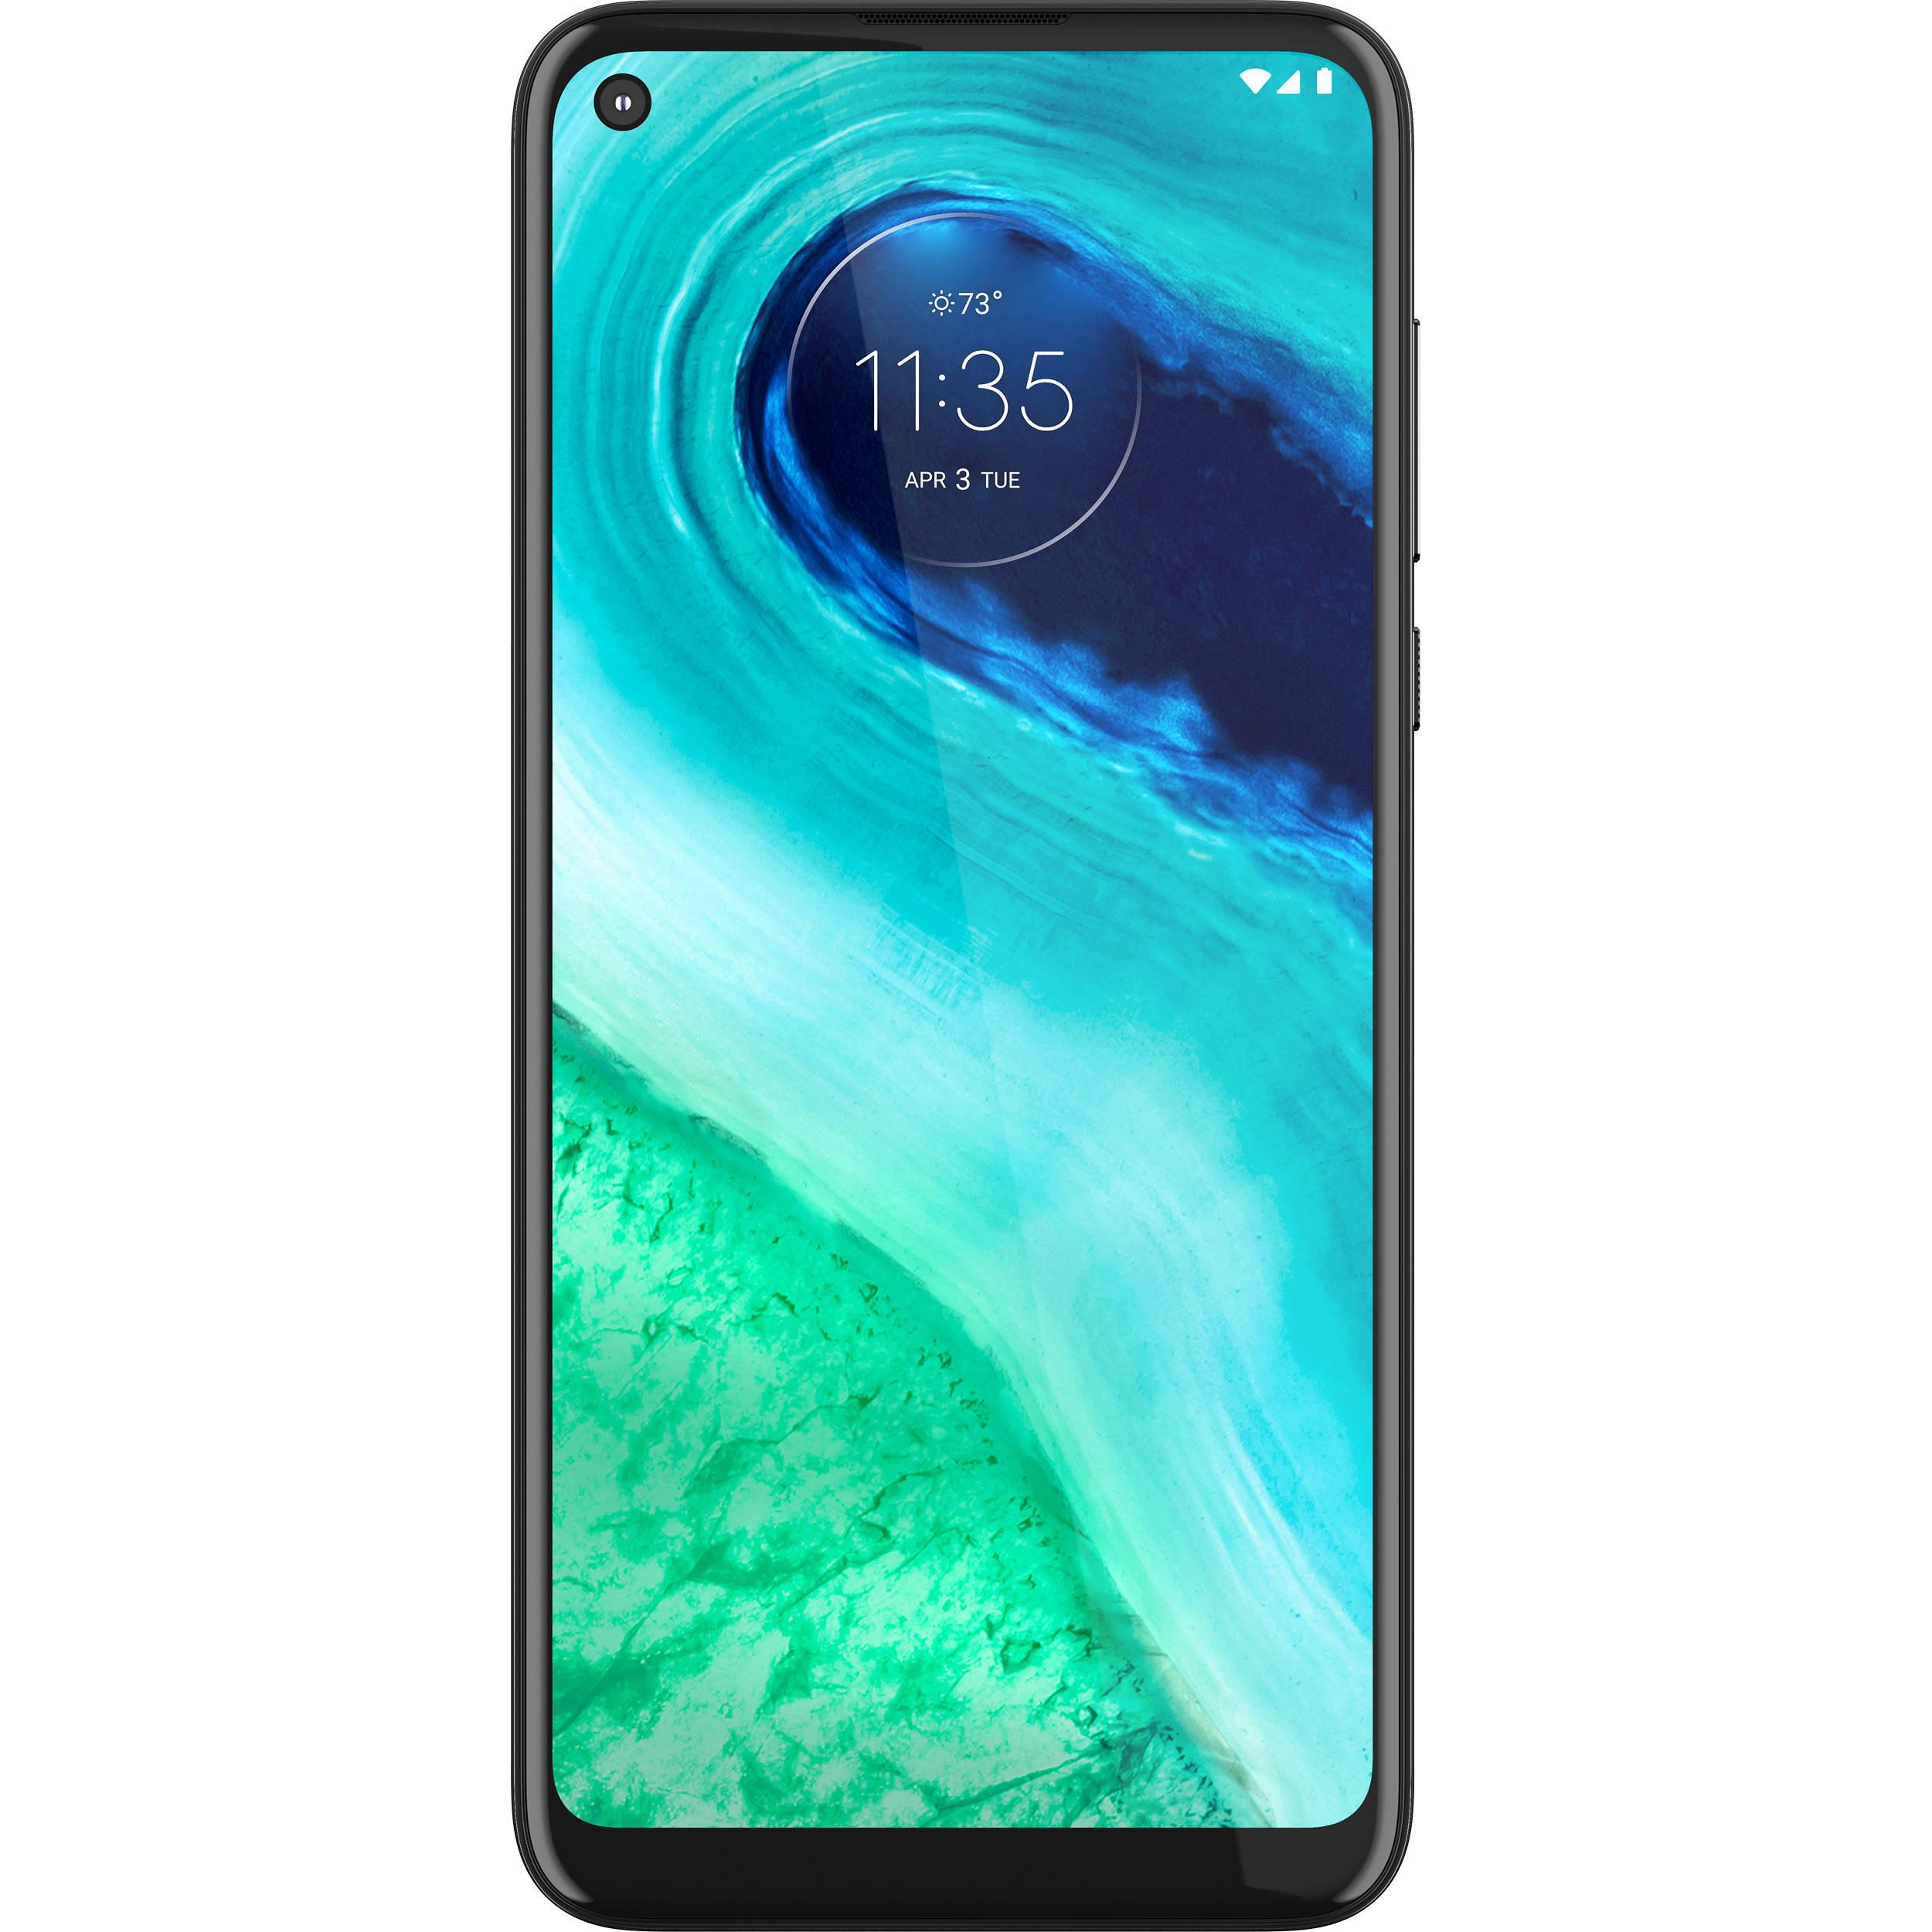 Moto g fast 32GB Smartphone (Unlocked, Pearl White) PAHN0000US